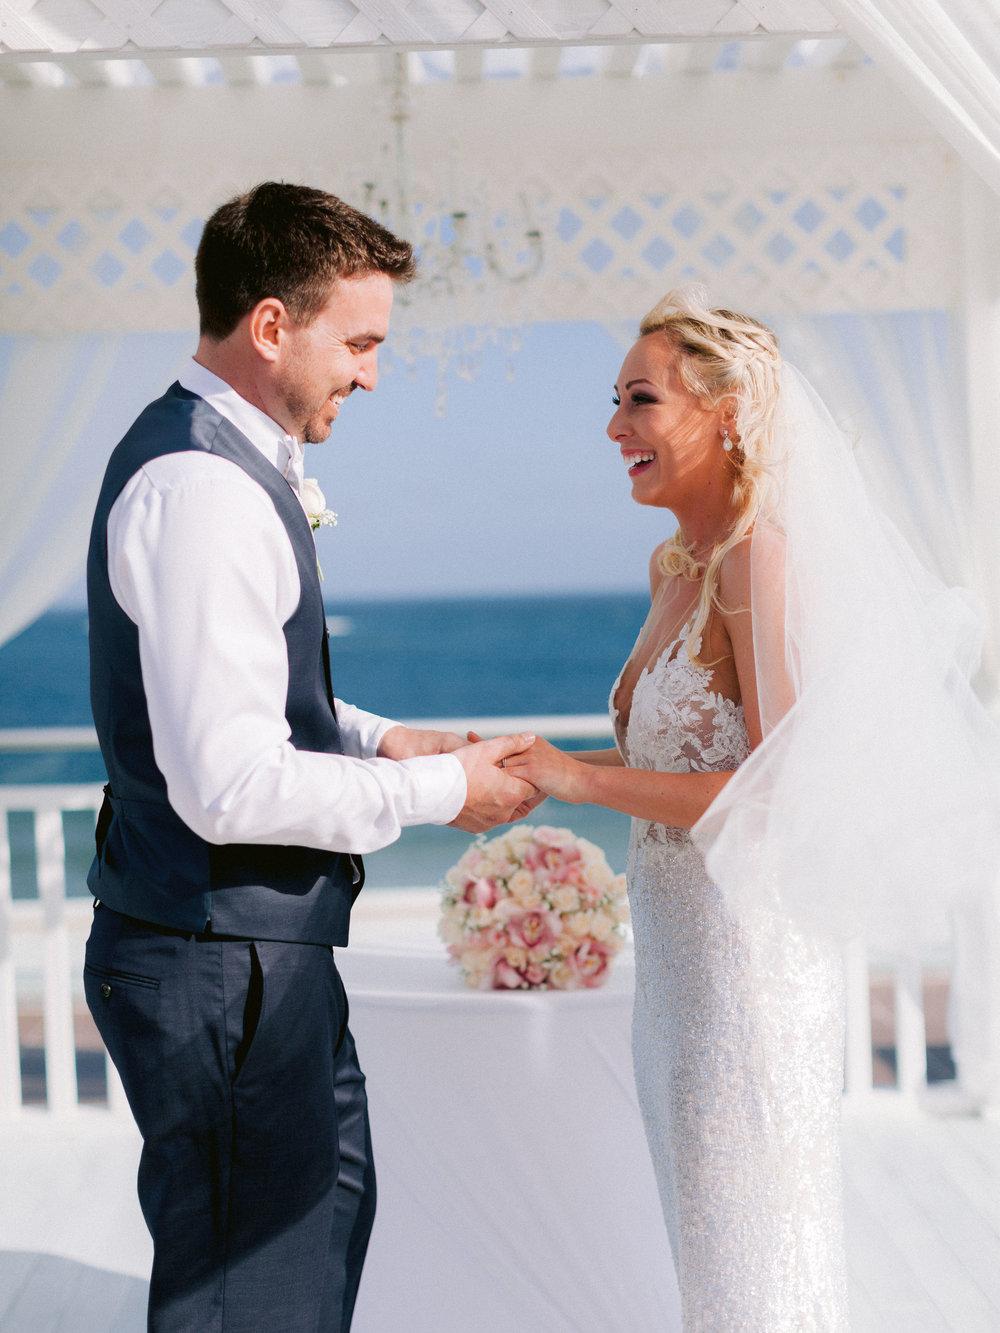 Kim_Jeff_Cancun Wedding_Ceremony_Kurtz_Orpia (71 of 119).jpg